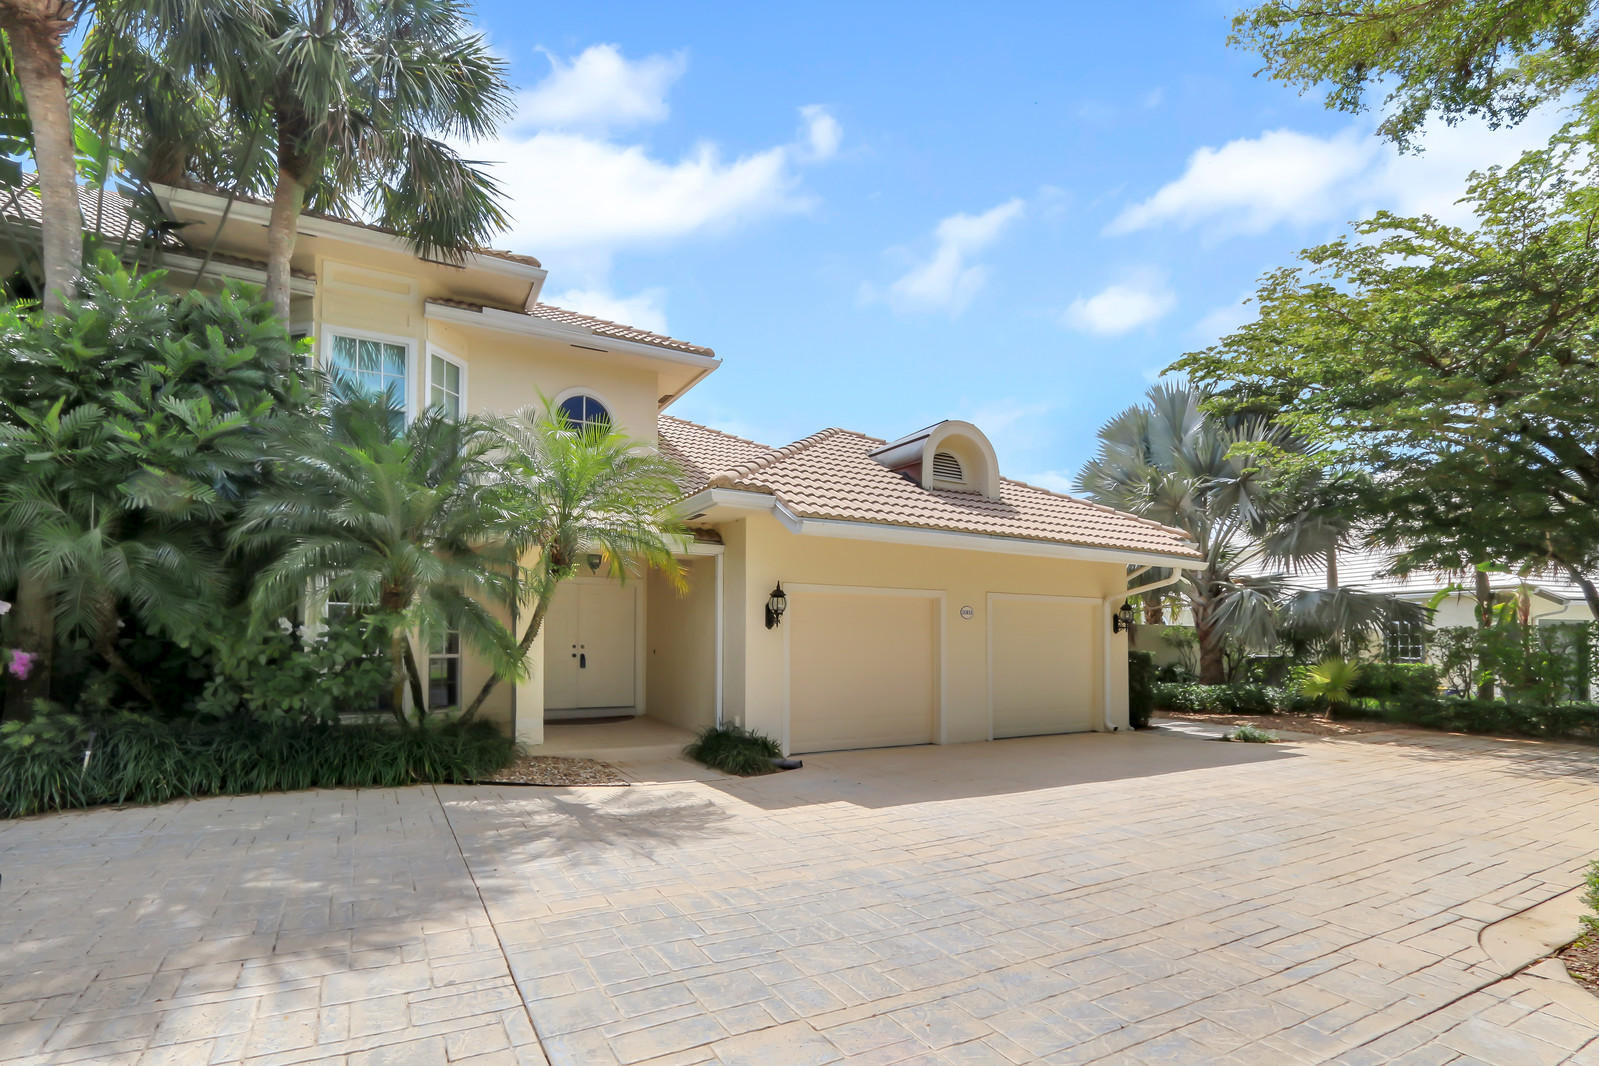 11851 Pebblewood Drive, Wellington, Florida 33414, 3 Bedrooms Bedrooms, ,3 BathroomsBathrooms,Condo/Coop,For Sale,Pebblewood,1,RX-10525746